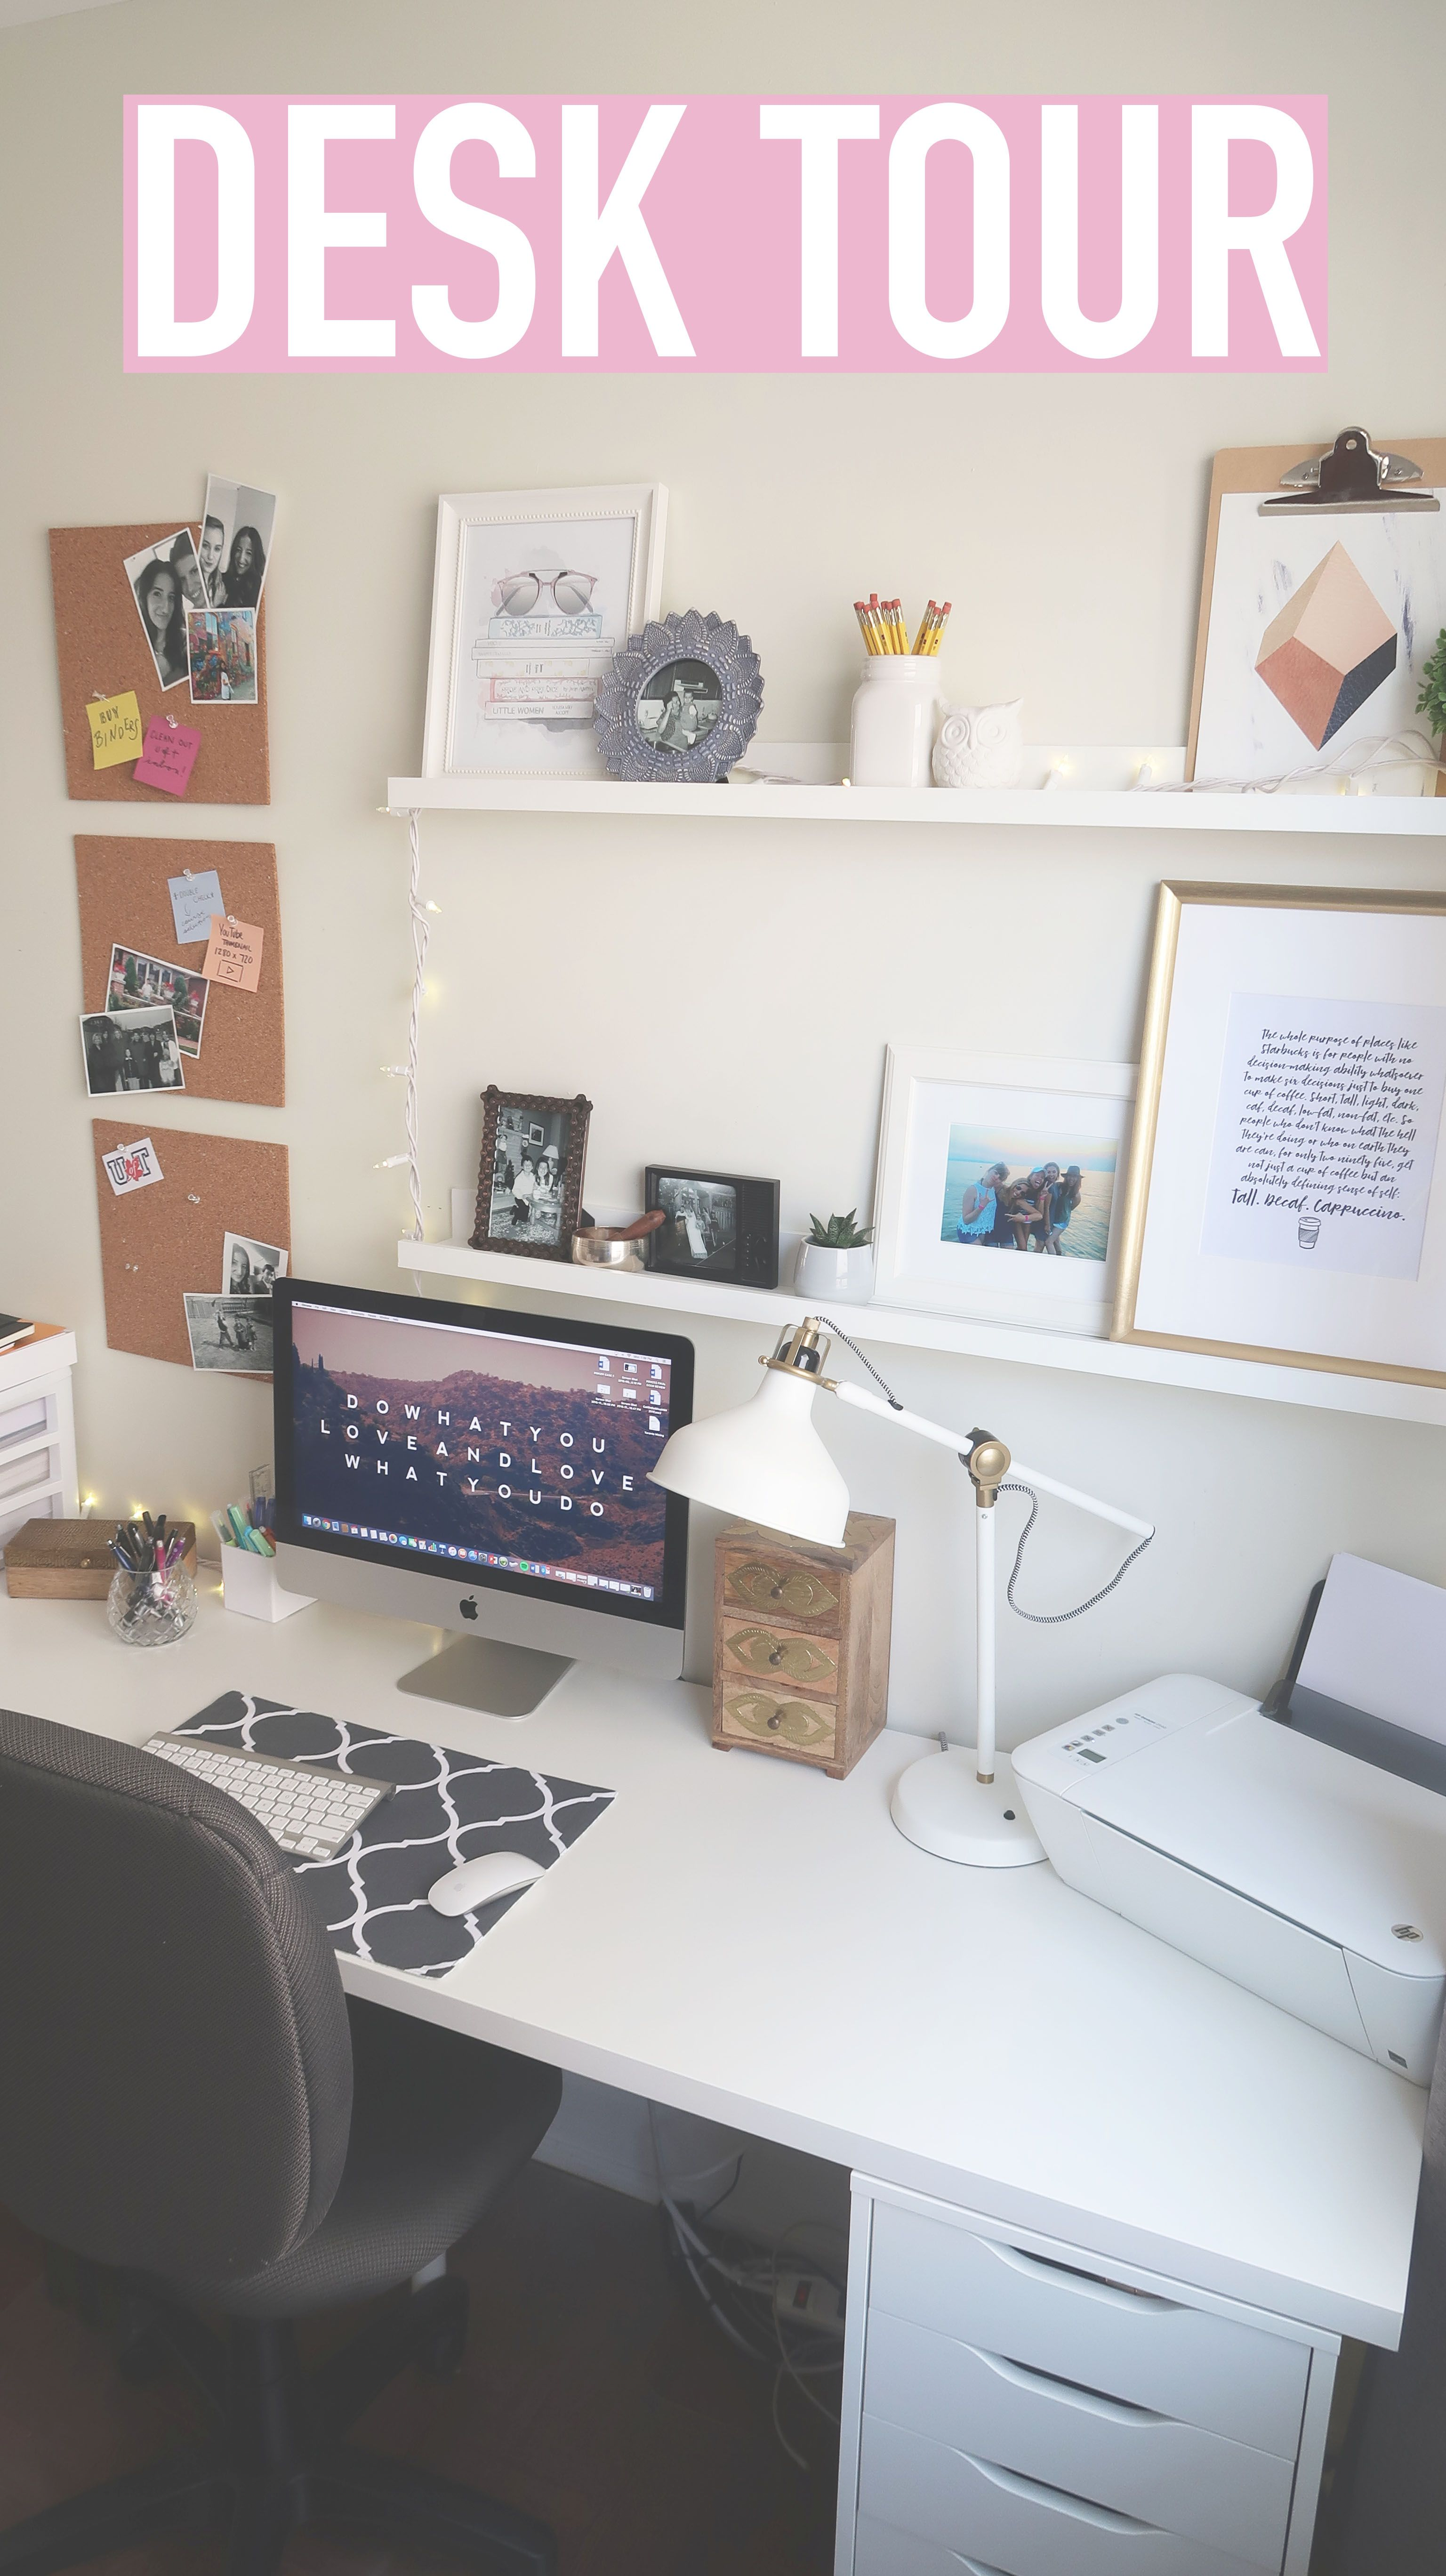 Desk Tour How To Organize Your Desk Tips Decor Bedroom Desk Organization Small Desk Organization Desk Organization College